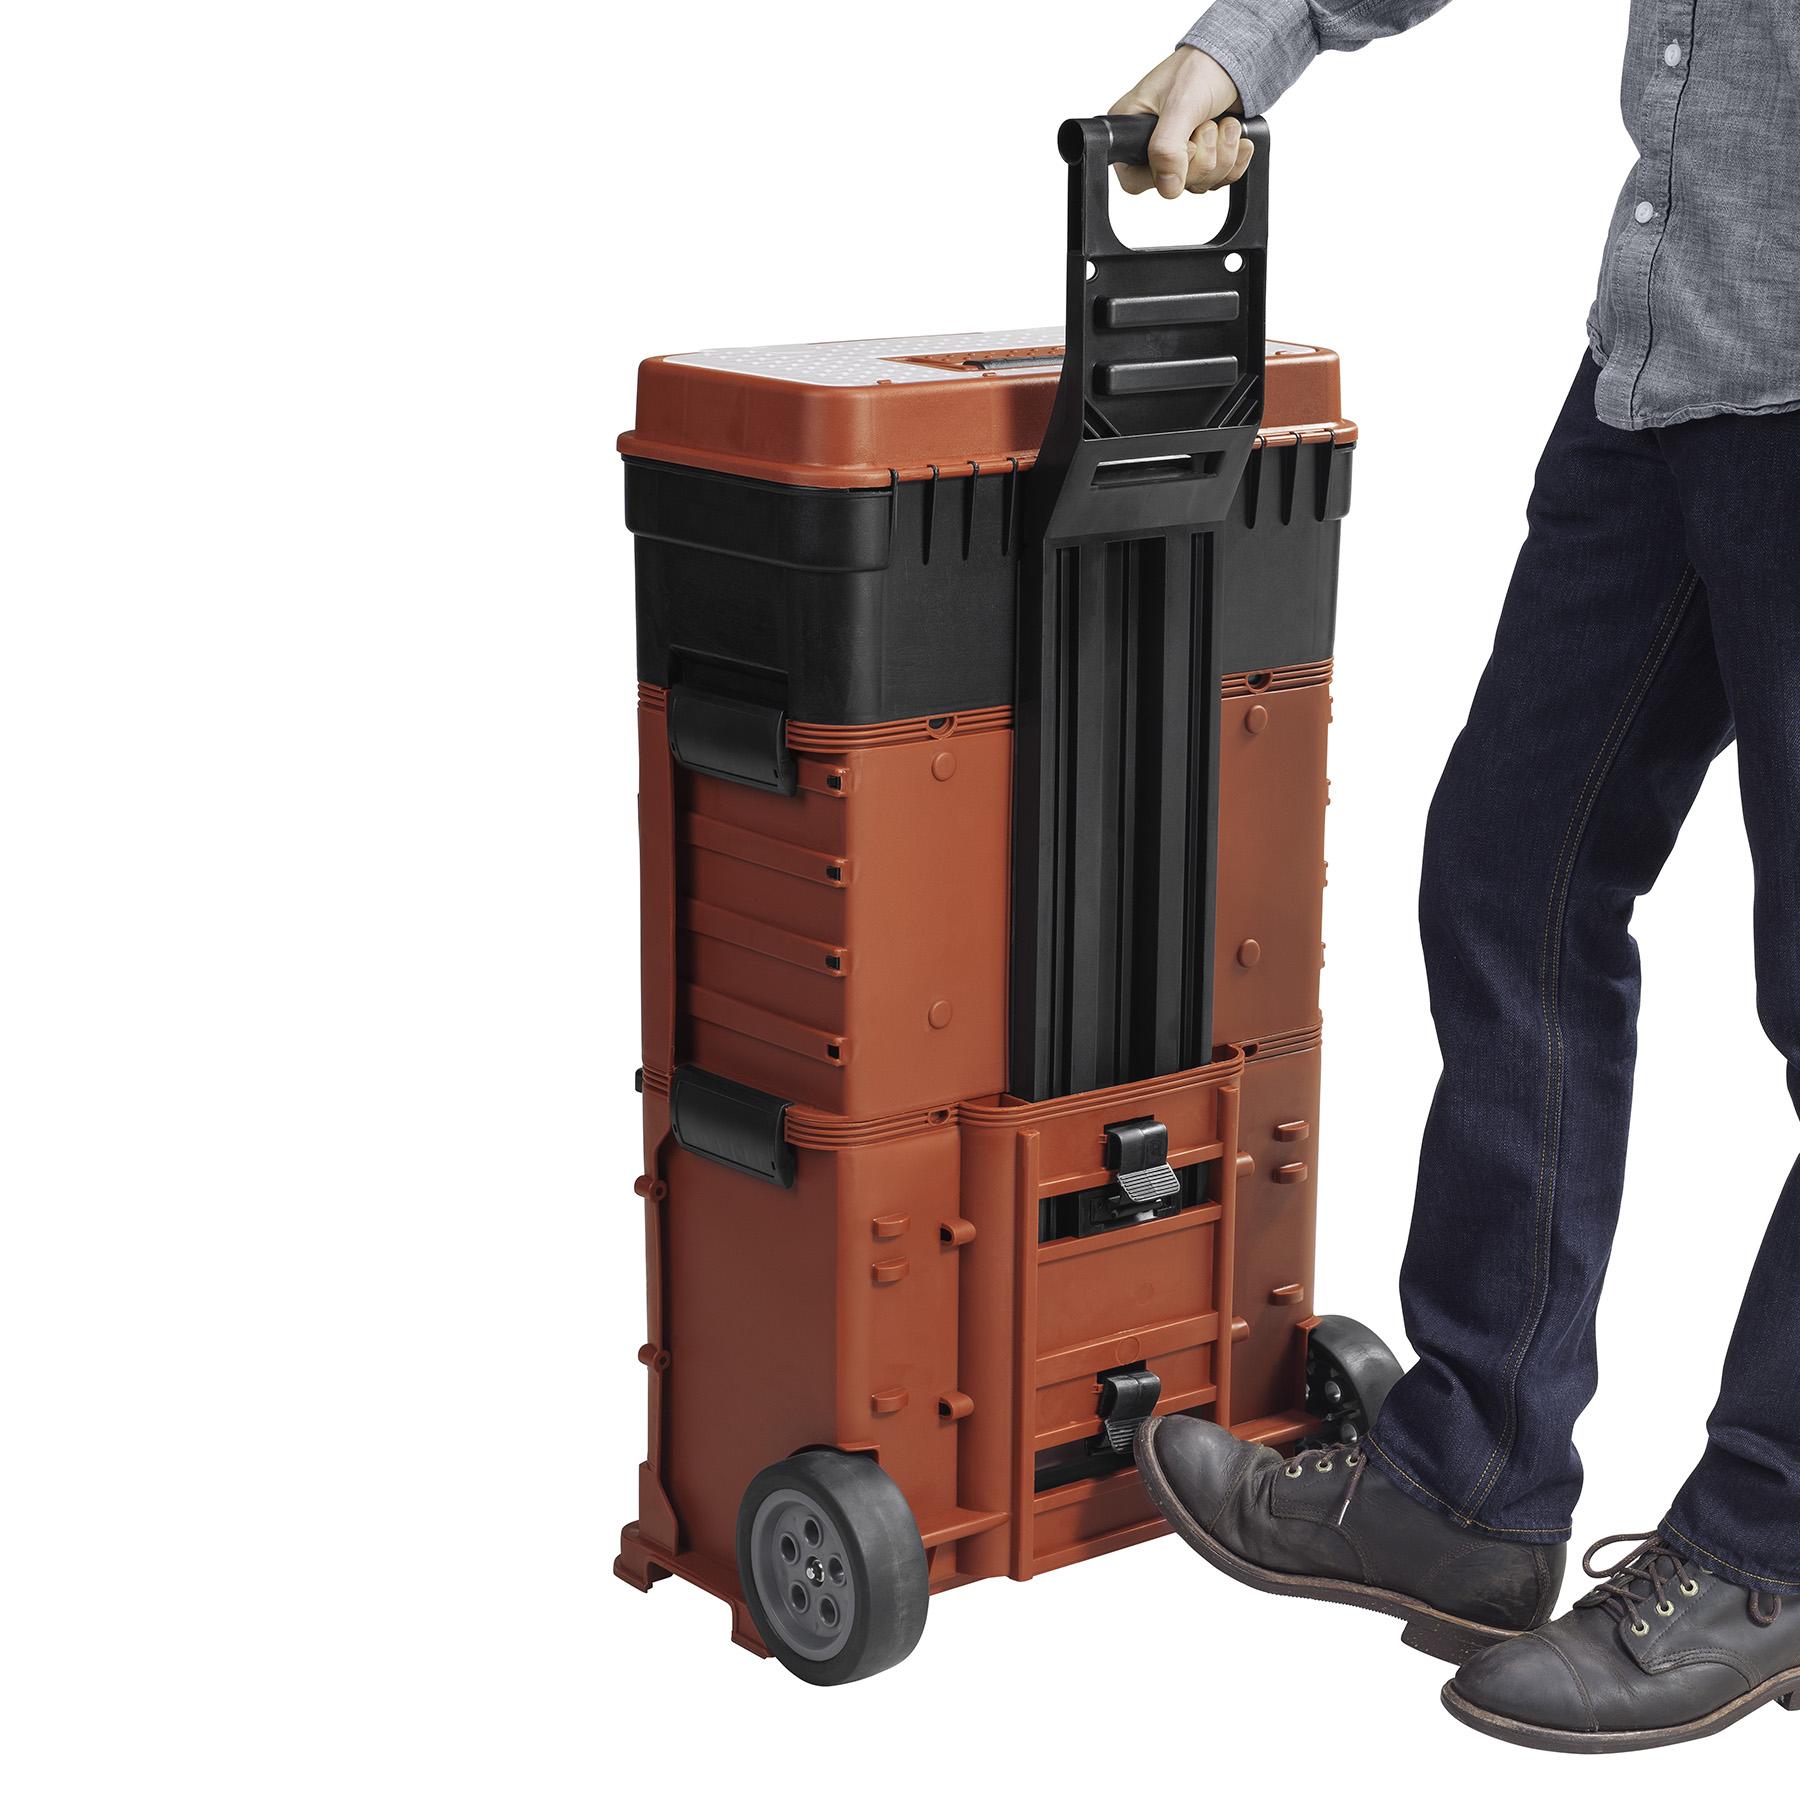 Craftsman 236-piece Mechanics Tool Set and Rolling Storage Combination